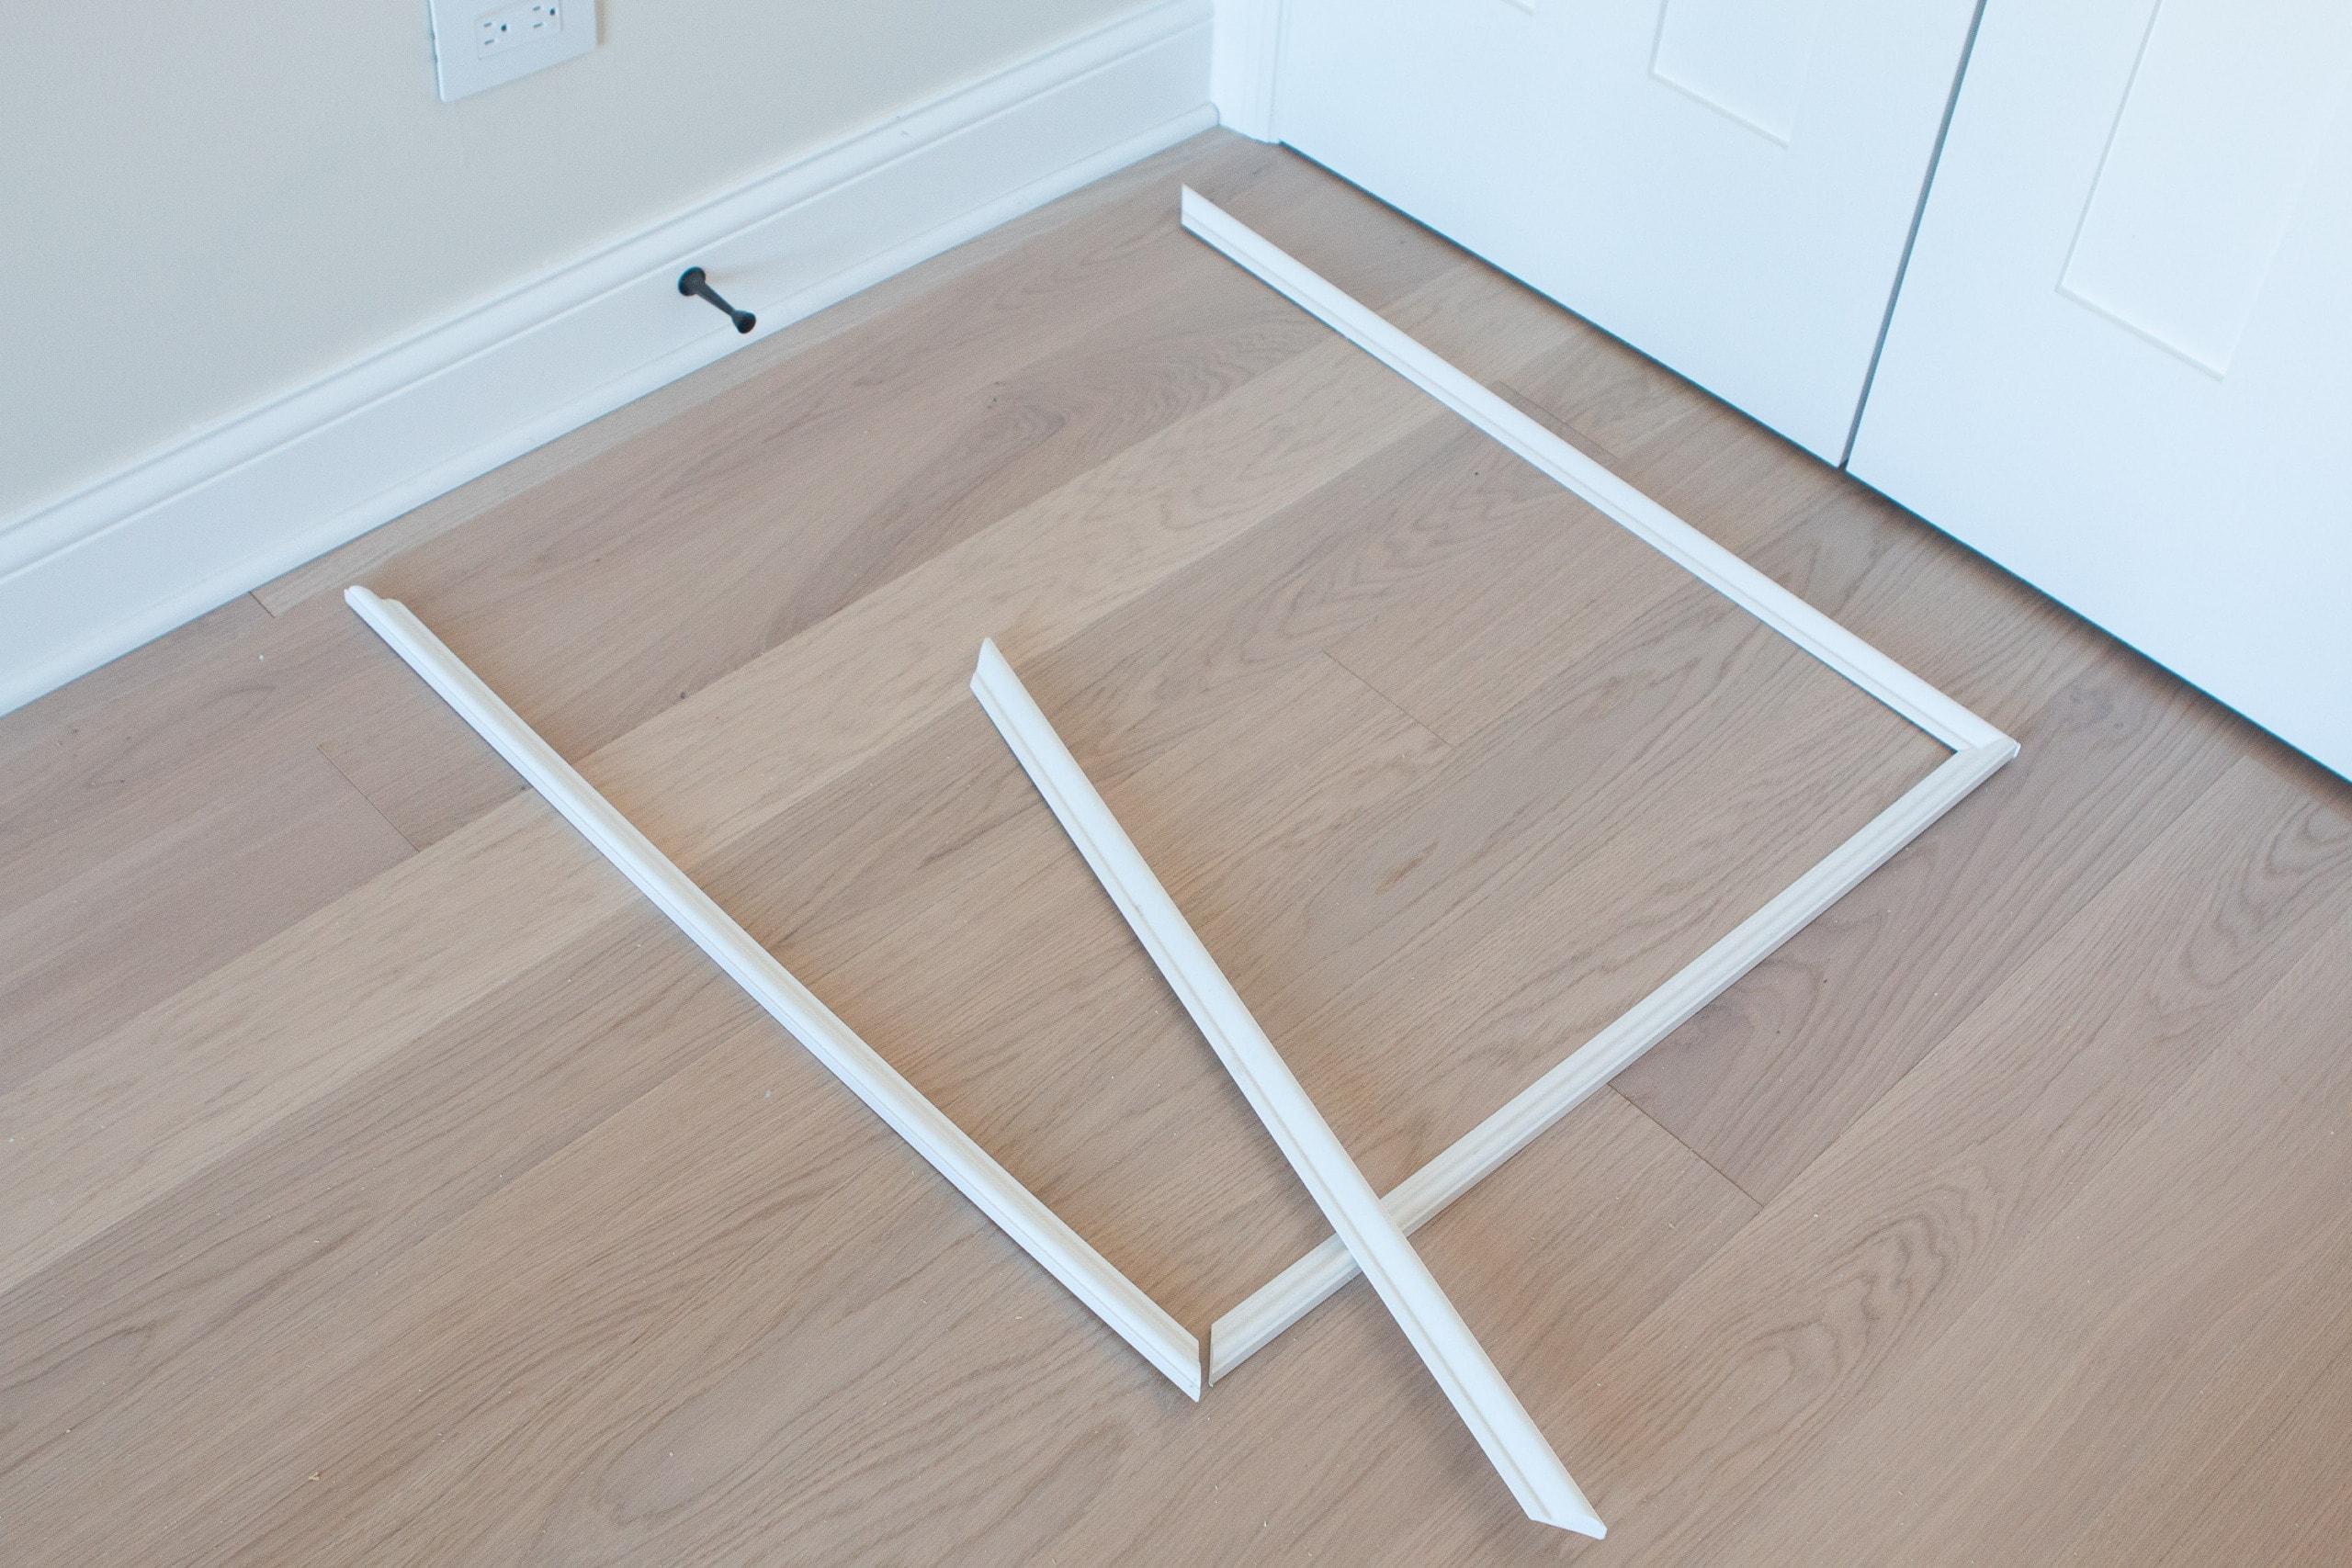 PVC molding to make chair rail